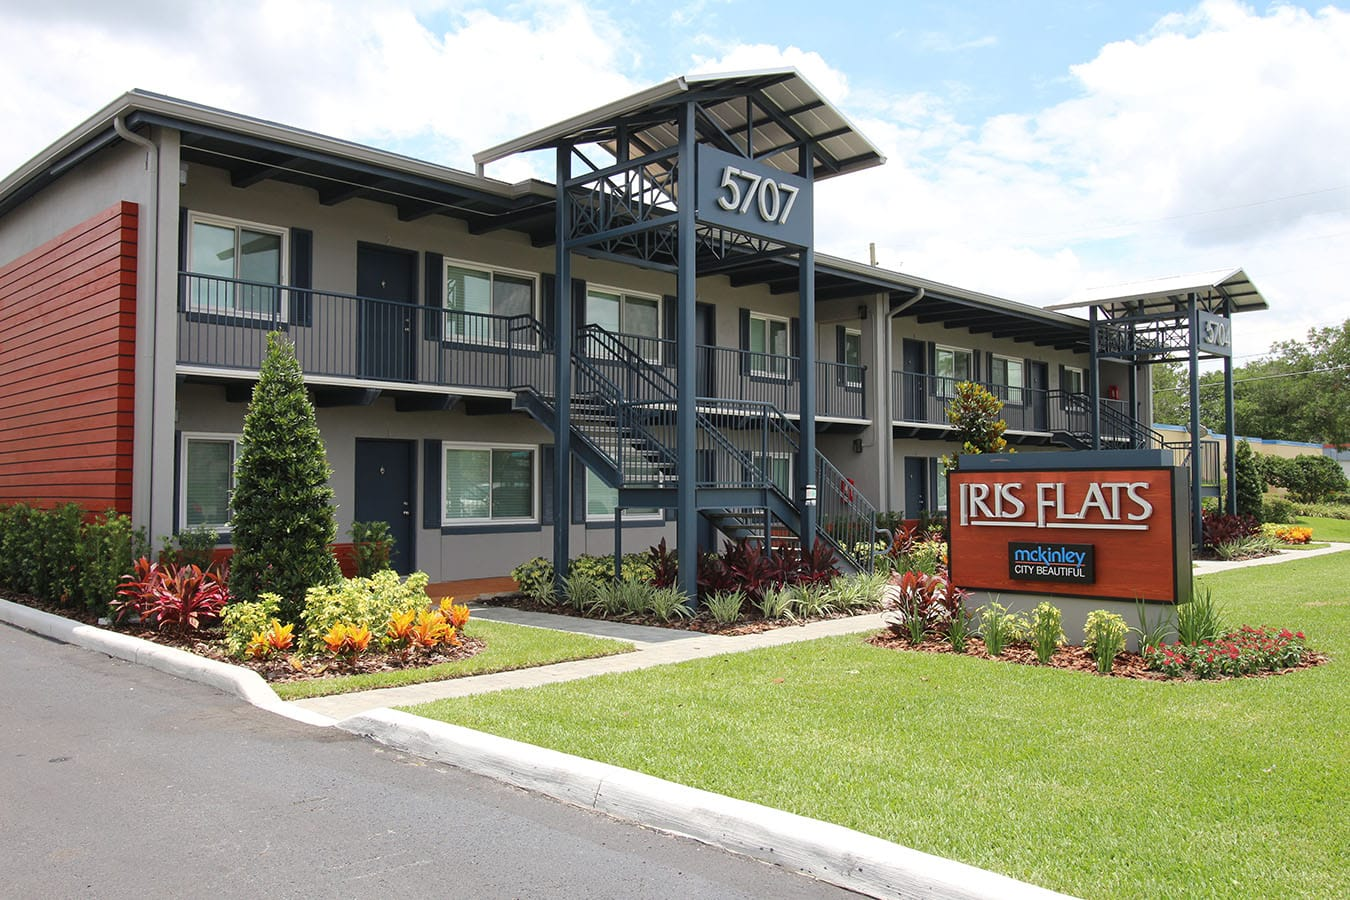 iris-flats-apartments-1